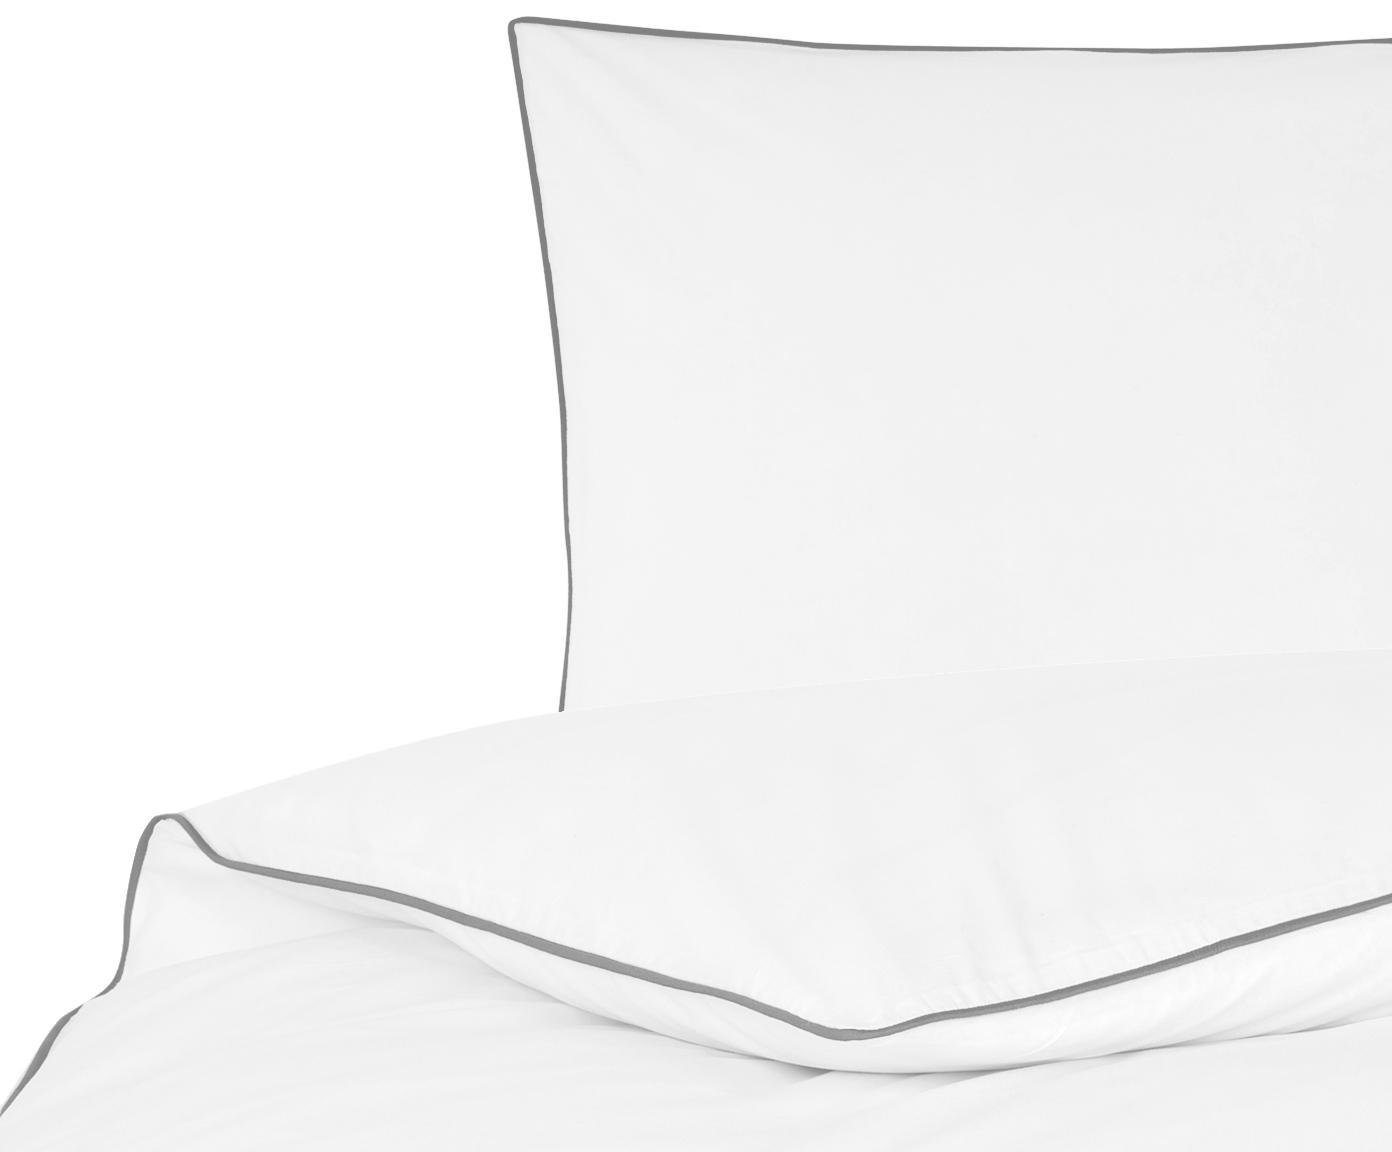 Baumwollperkal-Bettwäsche Daria in Weiß mit Keder, Webart: Perkal Fadendichte 200 TC, Weiß Kederumrandung: Dunkelgrau, 135 x 200 cm + 1 Kissen 80 x 80 cm